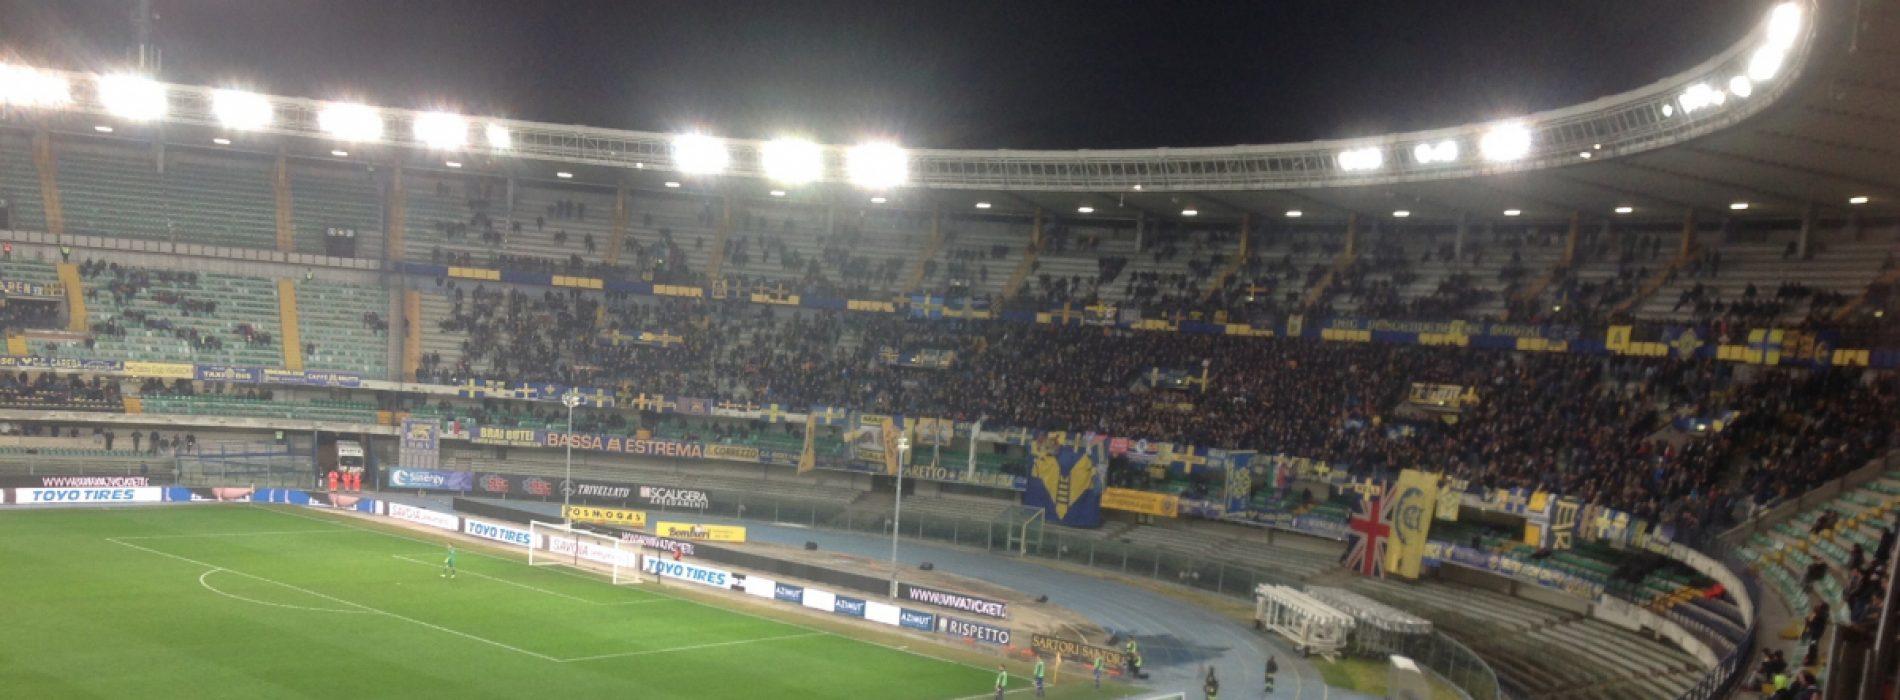 Verona – Juventus, cronaca e tabellino dal Bentegodi [LIVE]